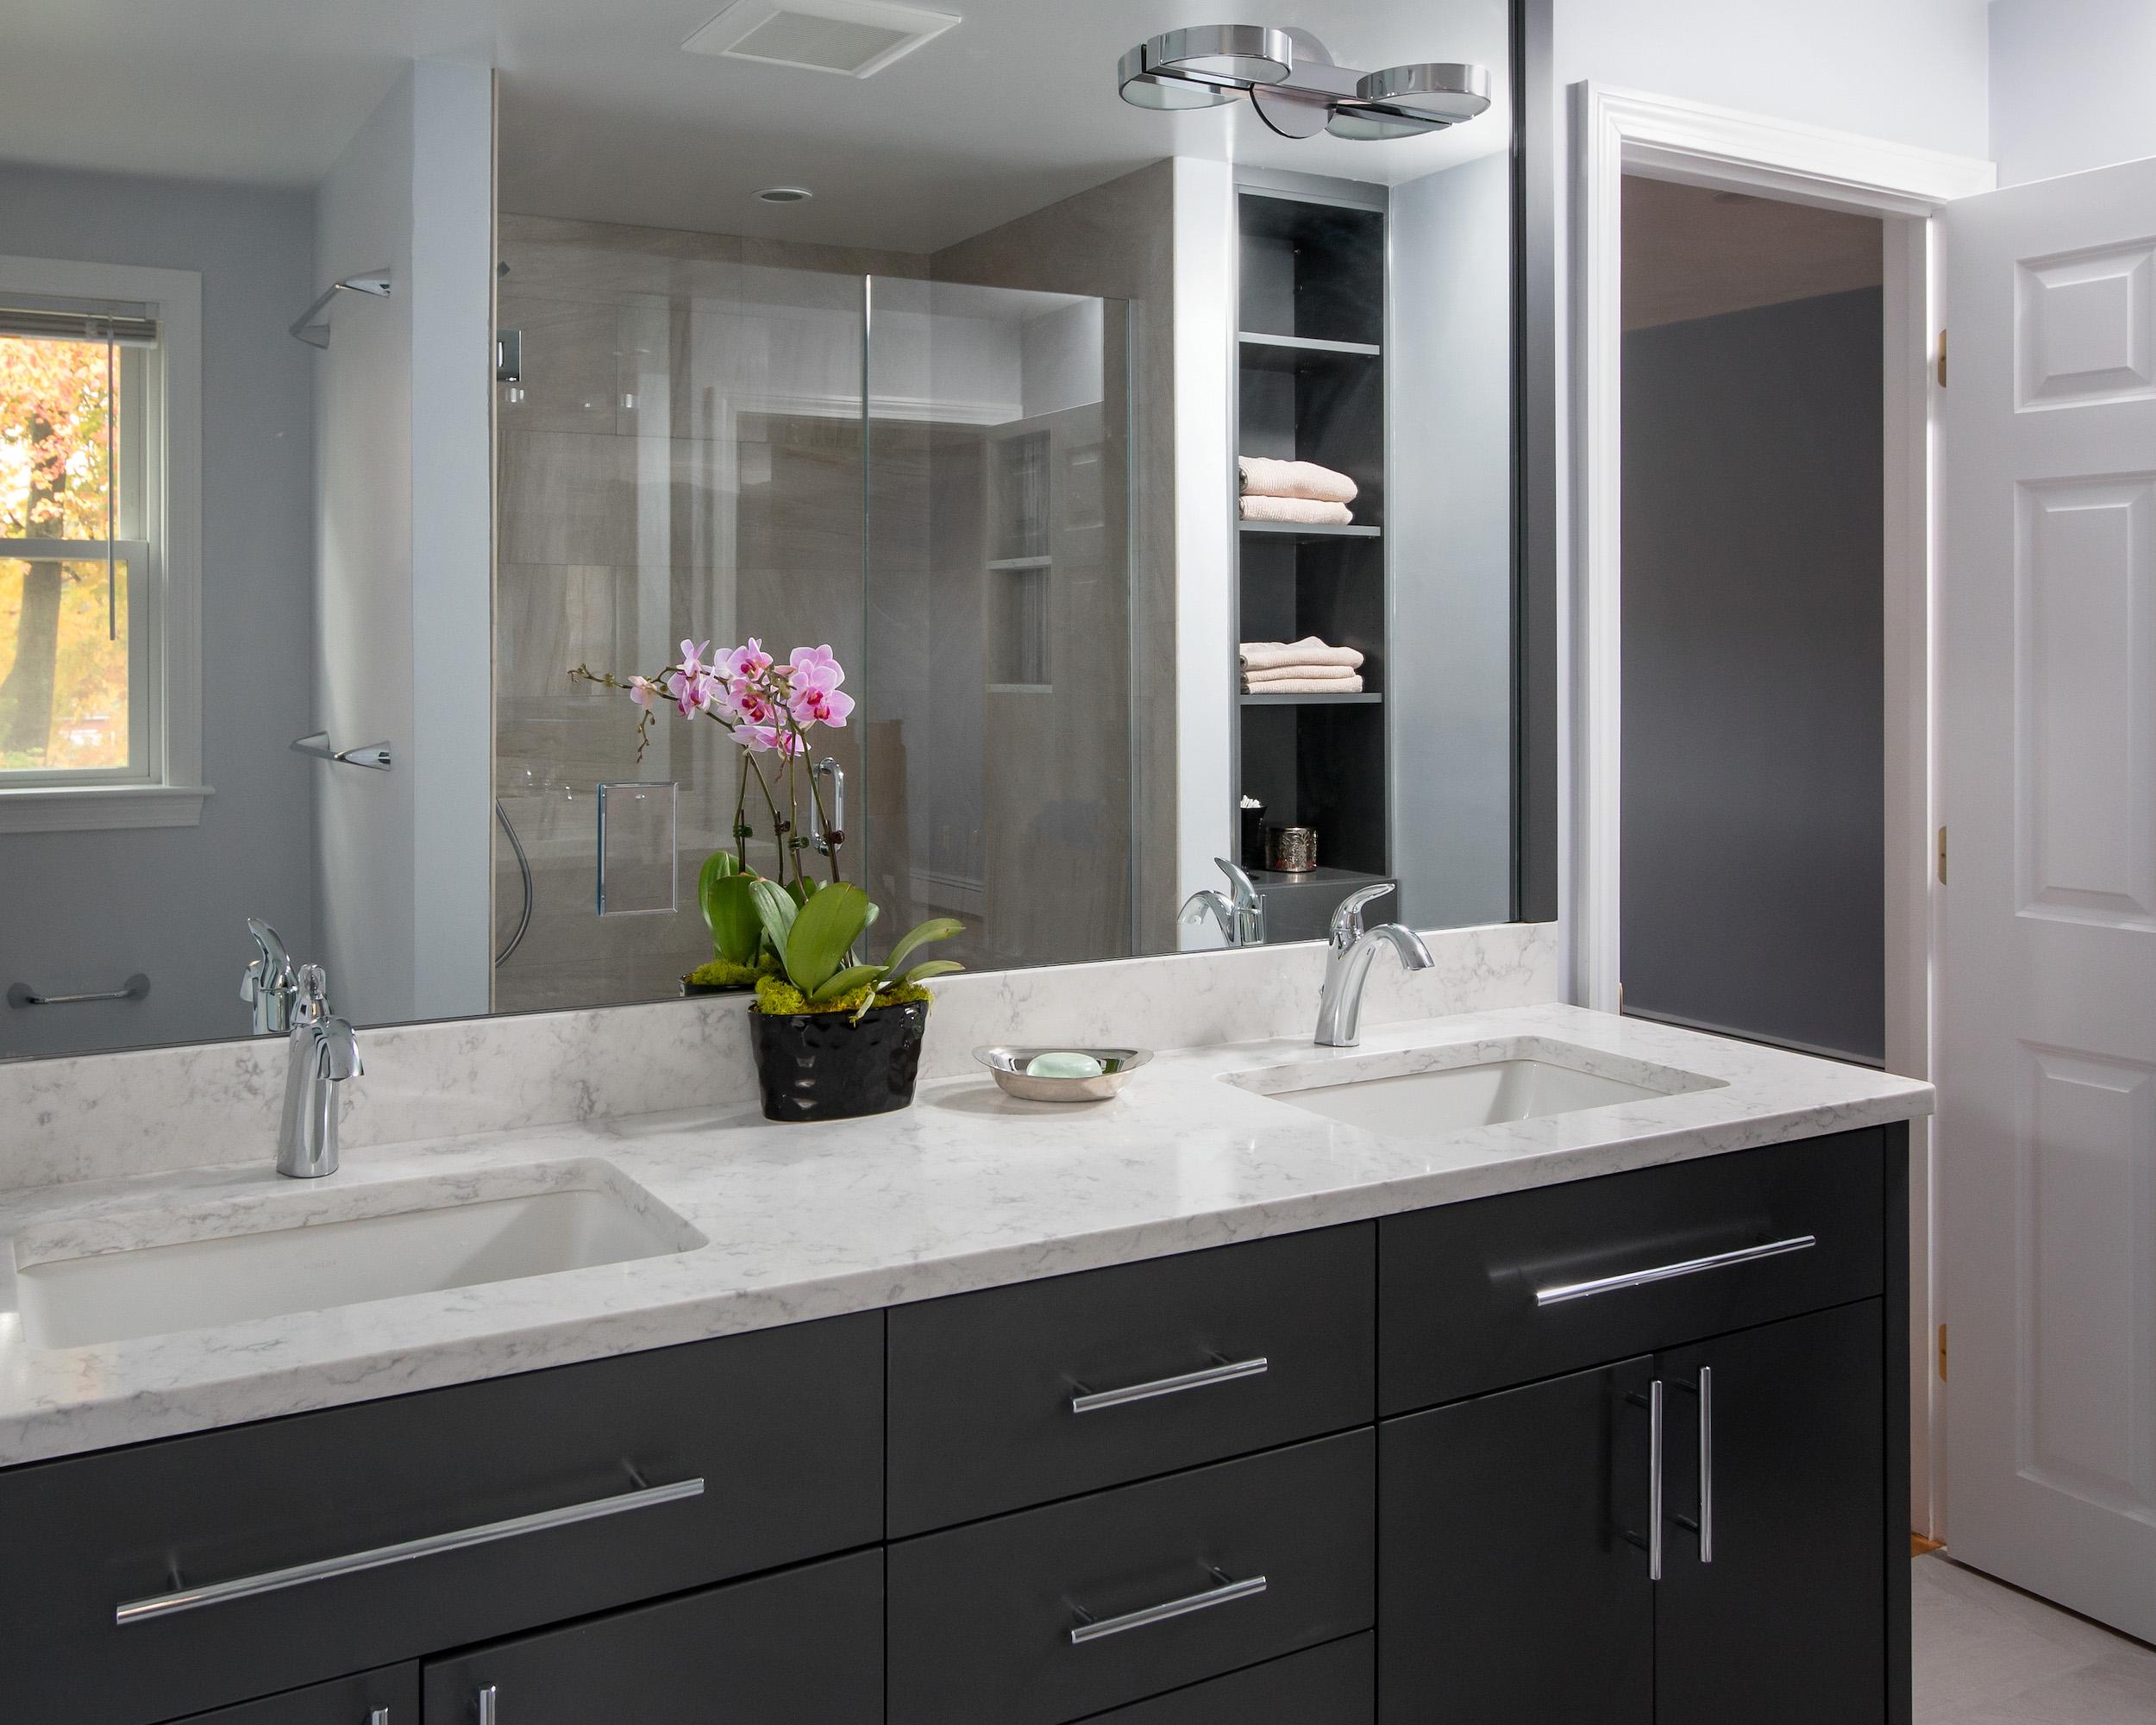 9-KitchenVisions-Master-Baths-Remodel-Framingham.jpg